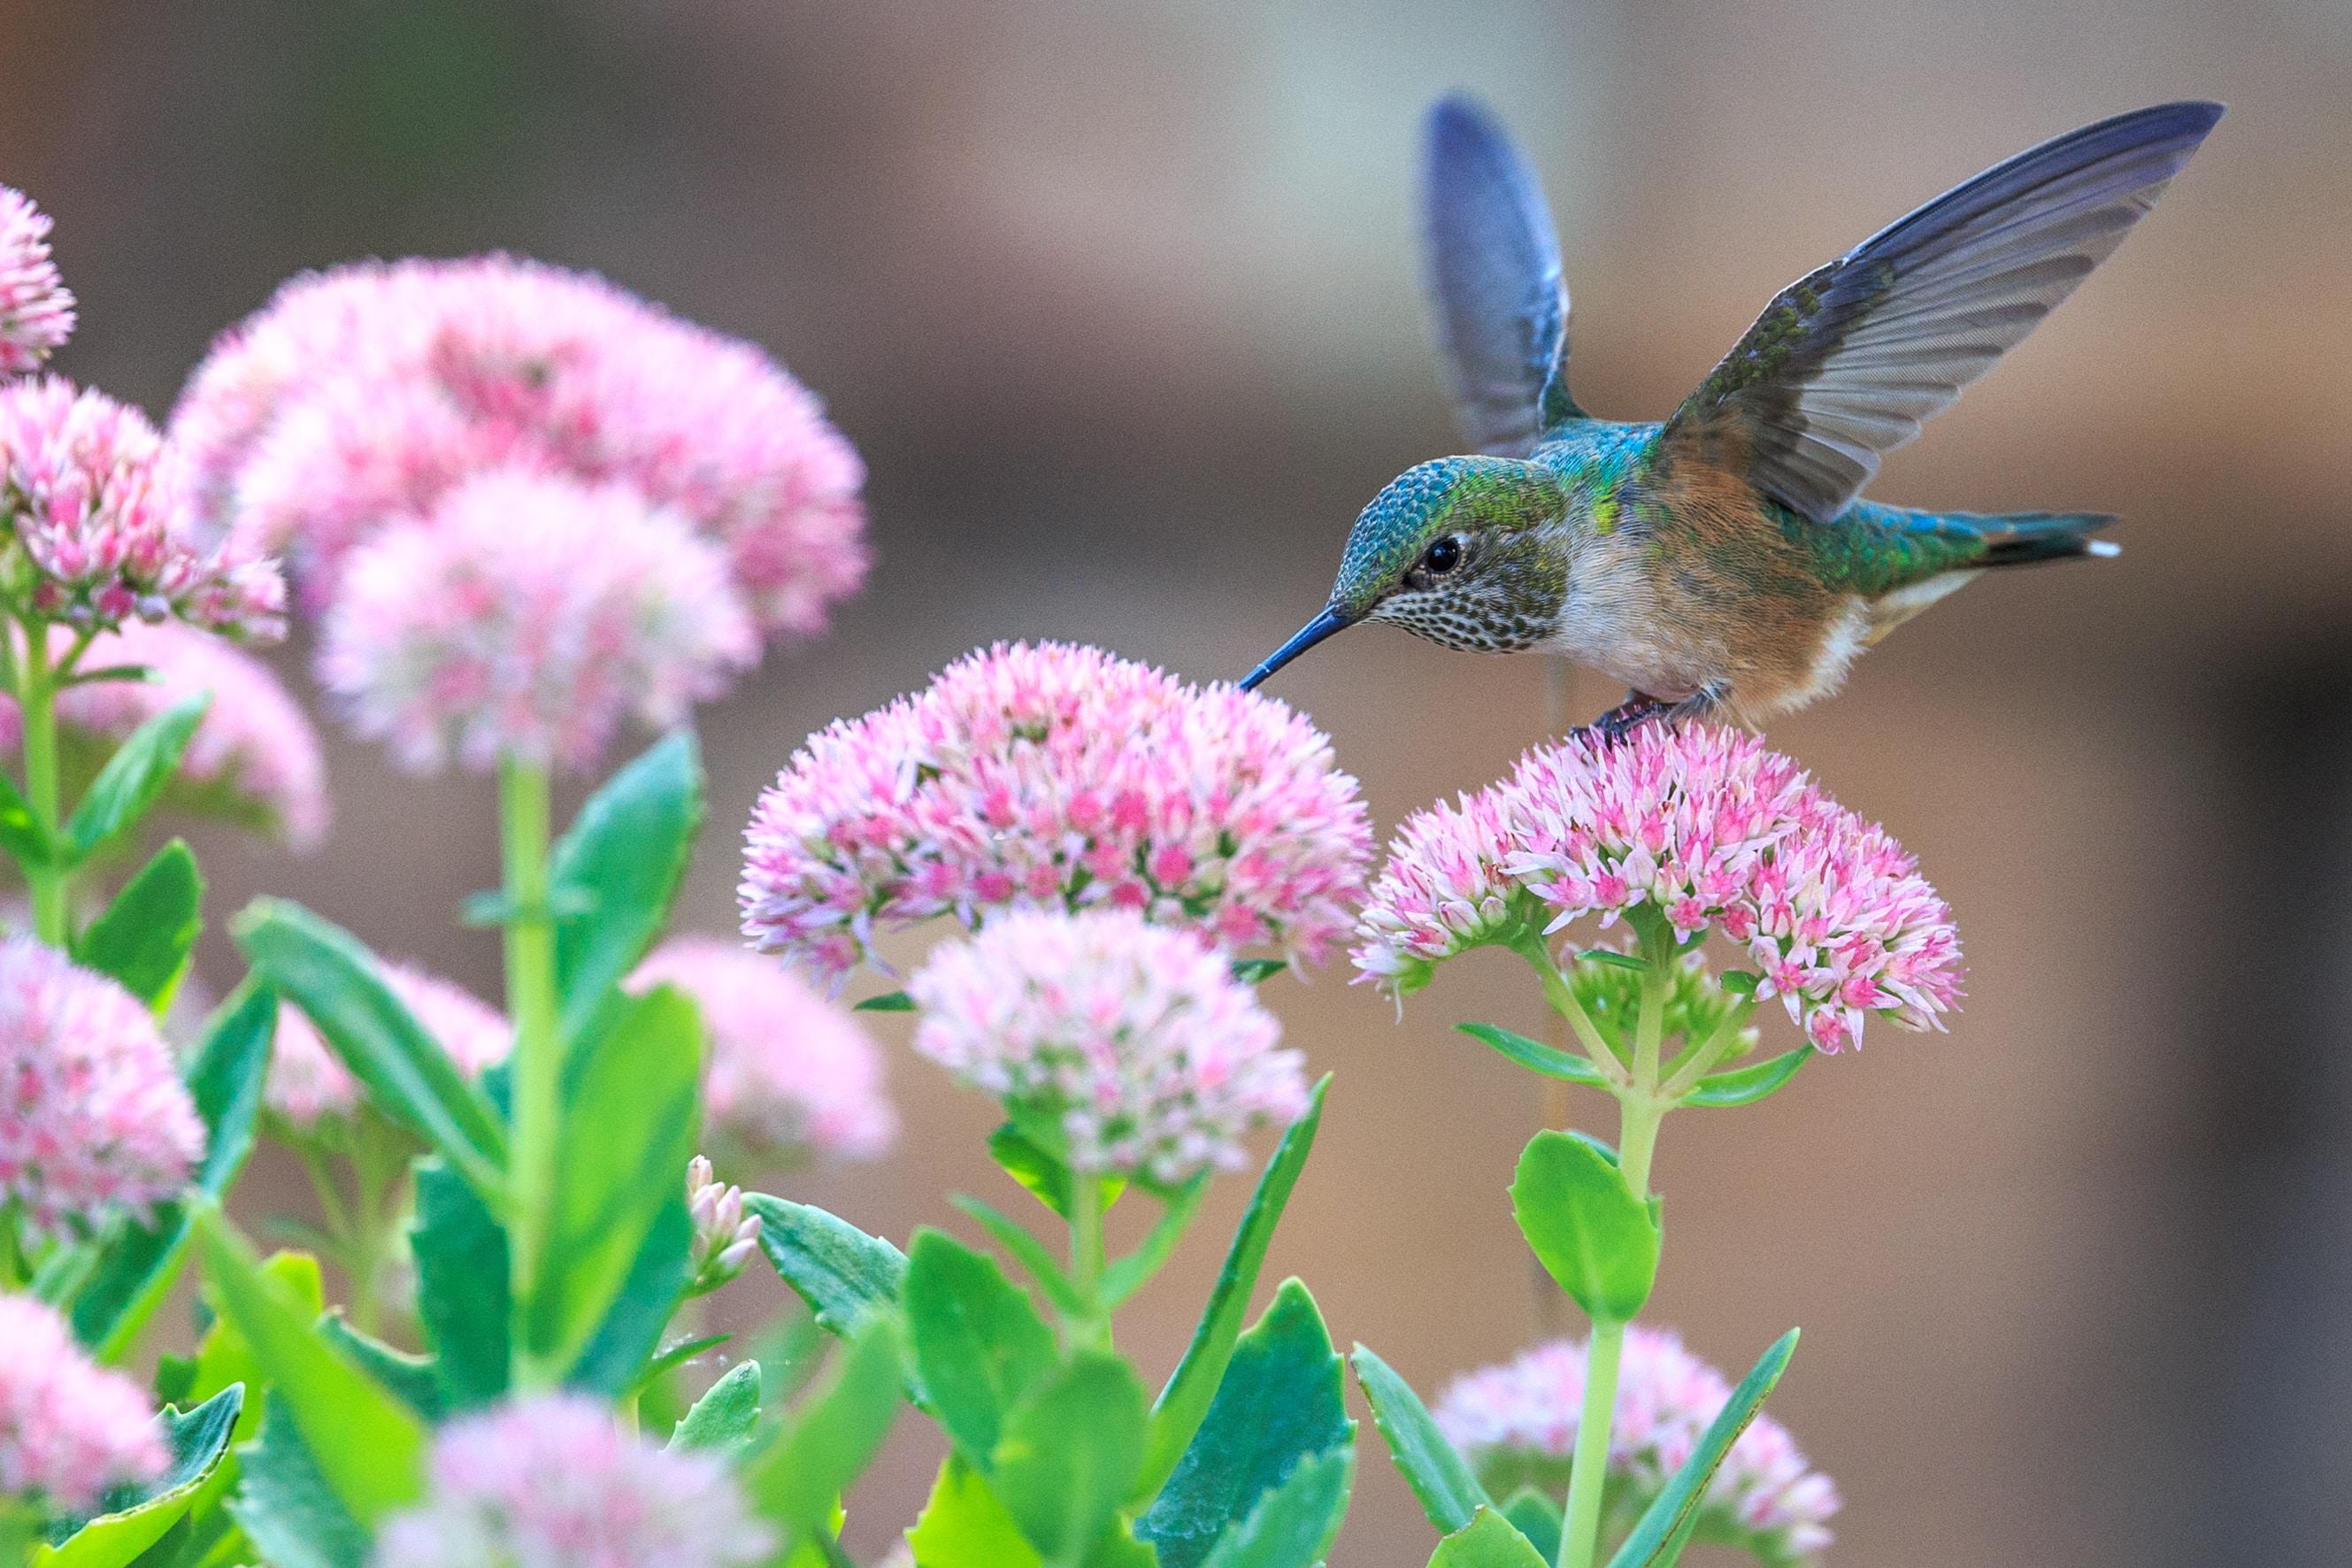 Hummingbird landing on pink flower with green stem